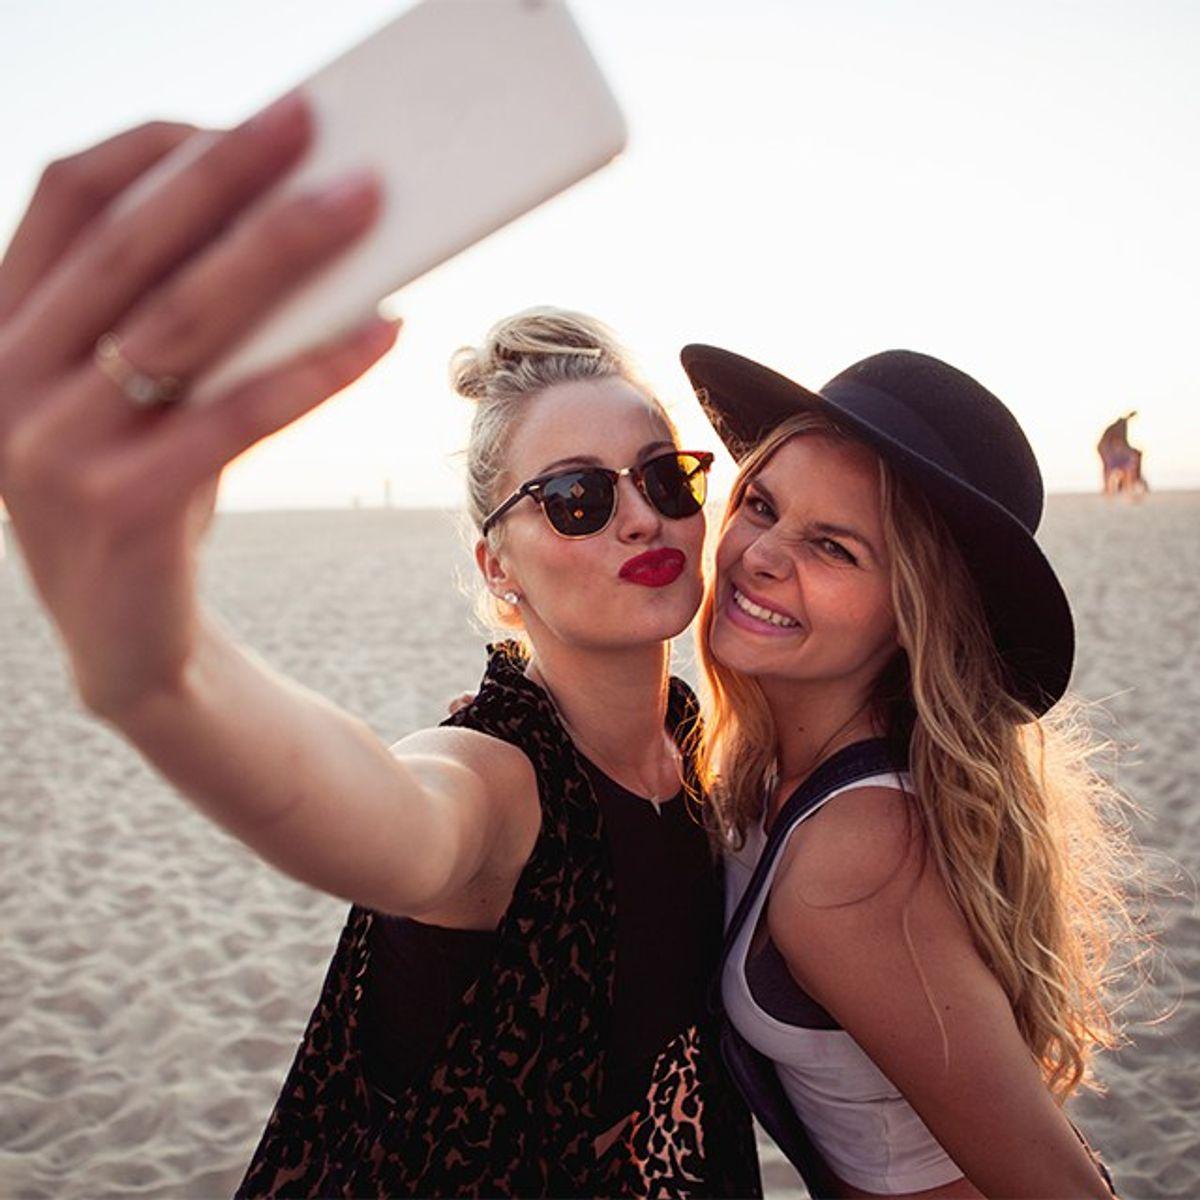 Social Media Has A Huge Impact On Self Esteem